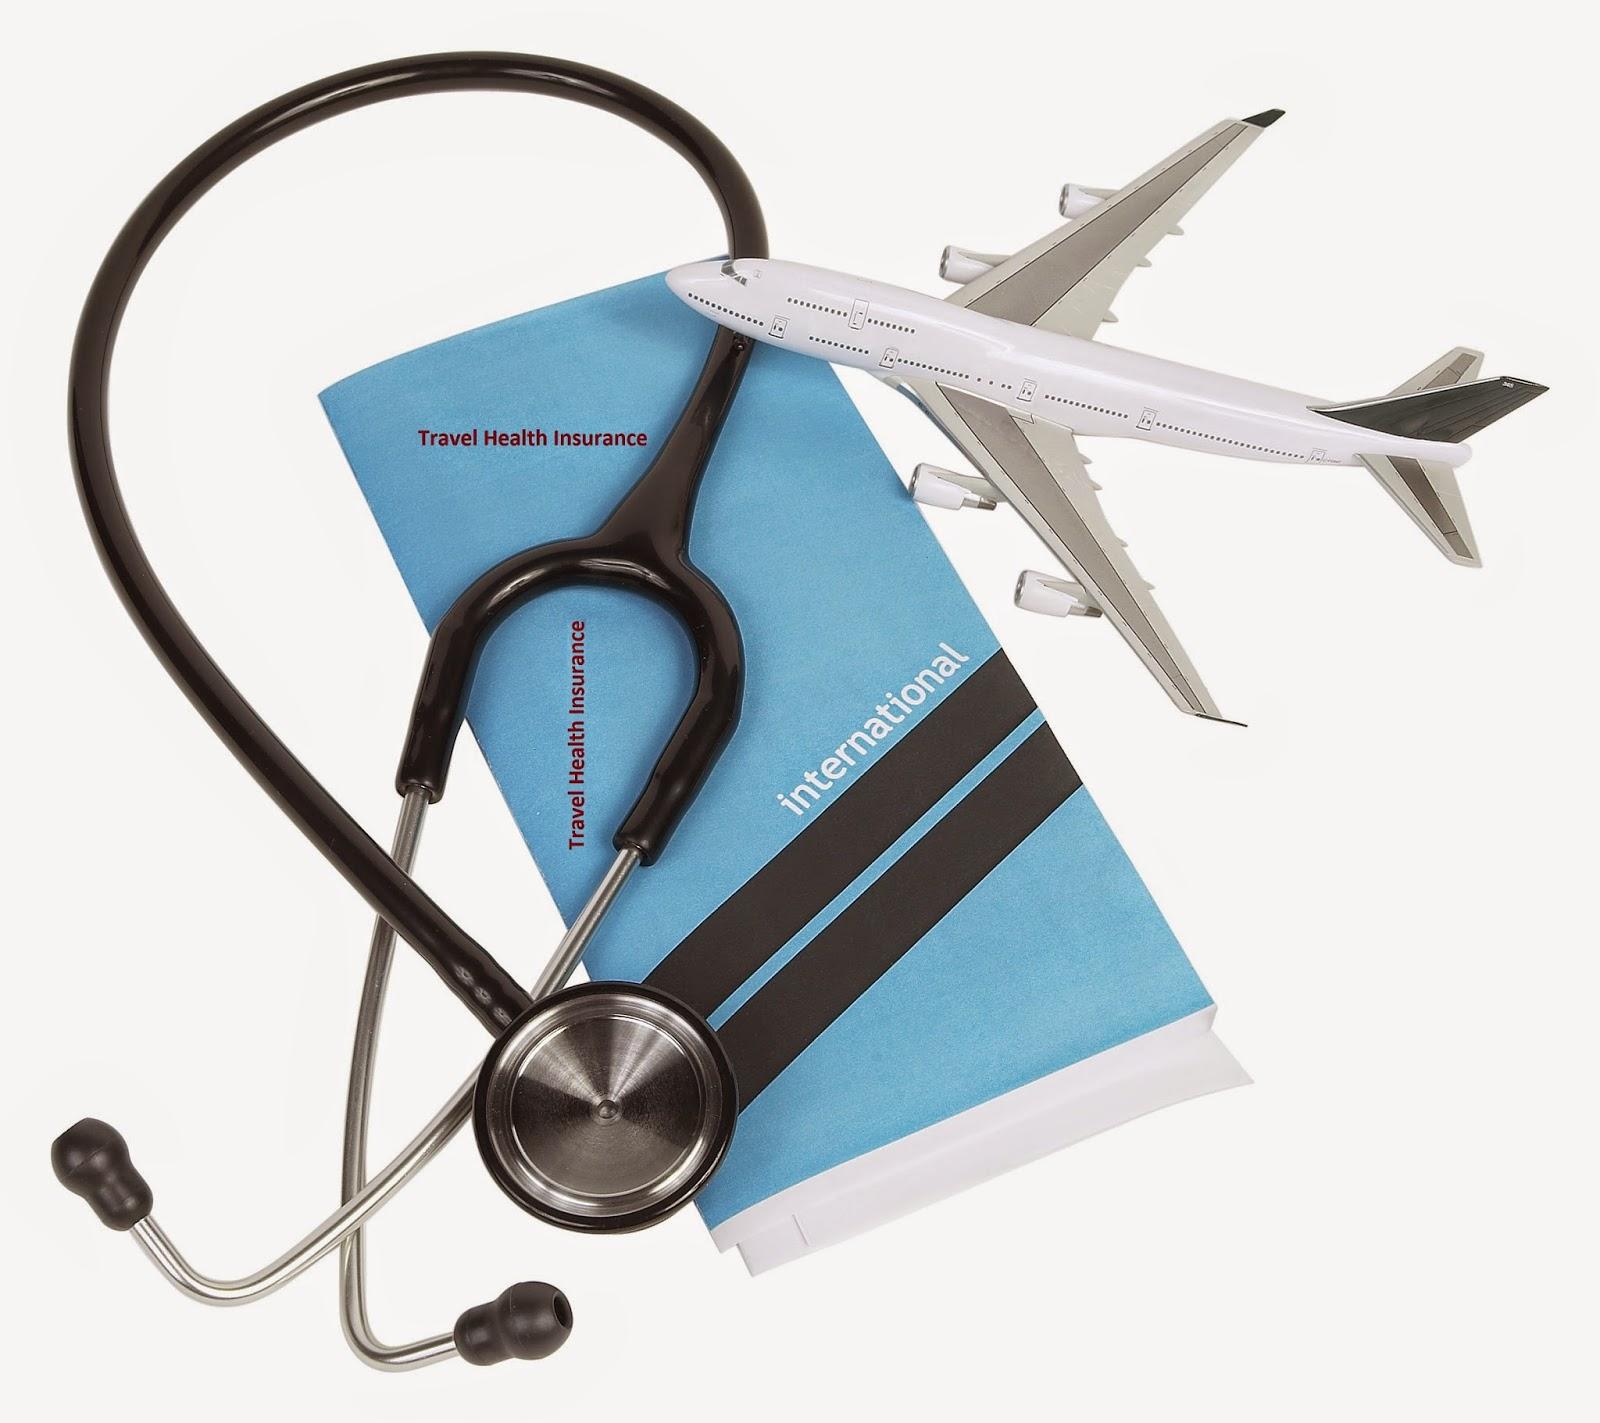 Travel Medical Insurance For Schengen Visa From India